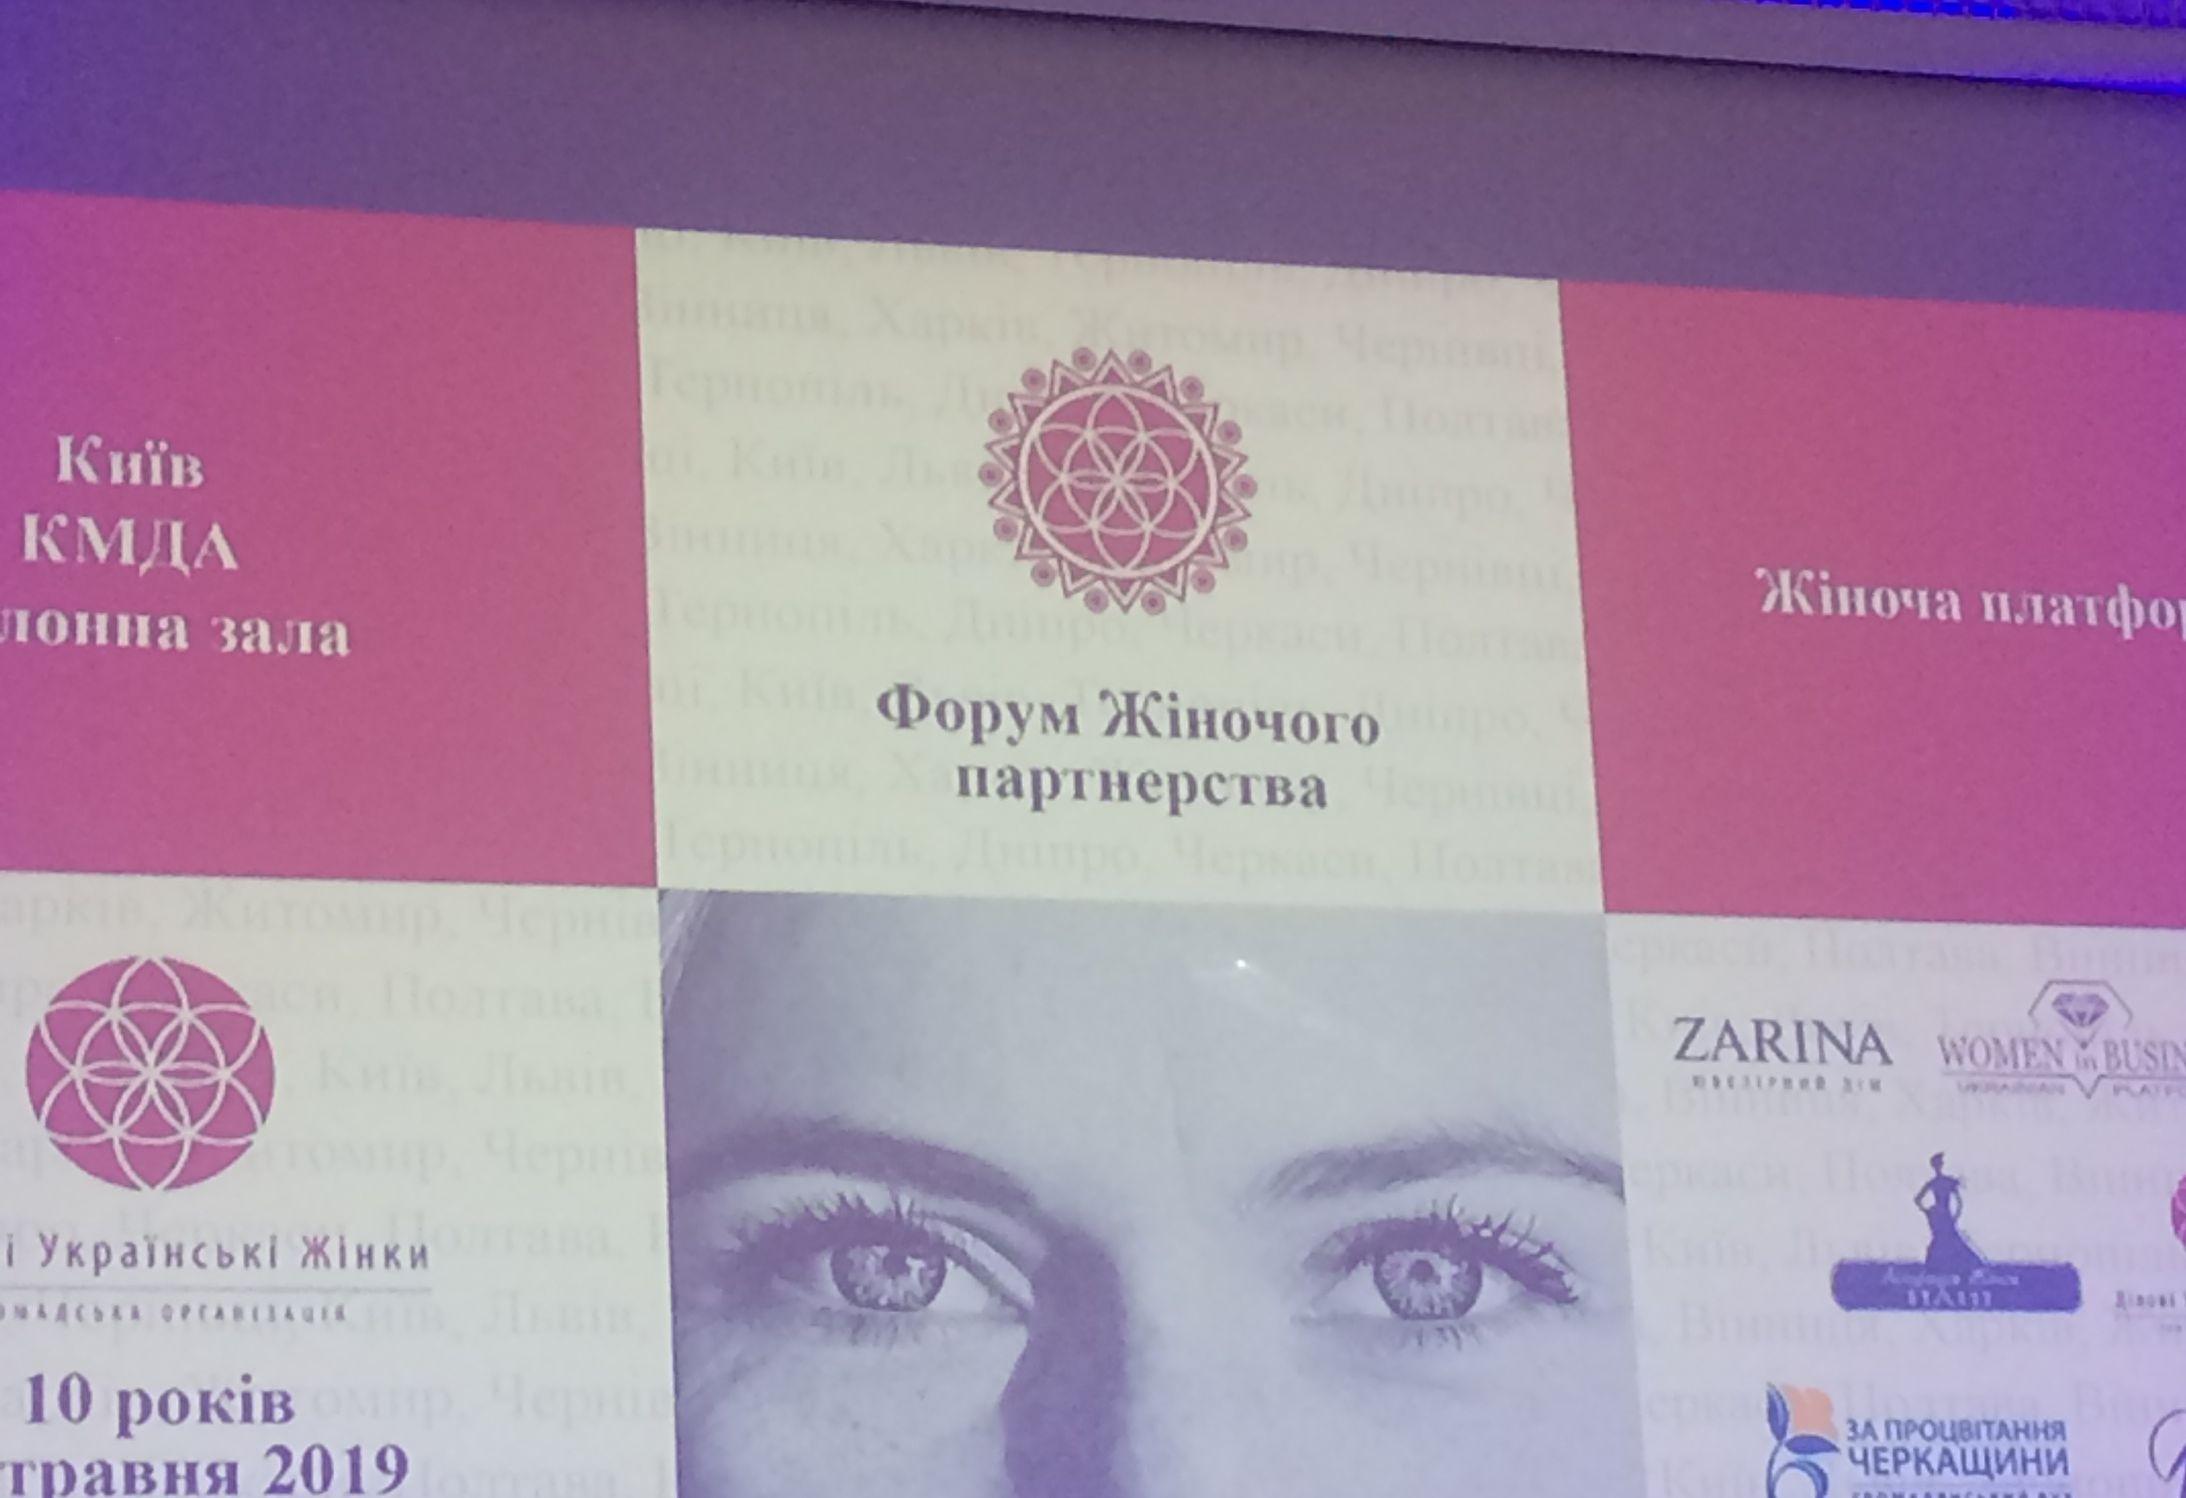 Women's Partnership Forum